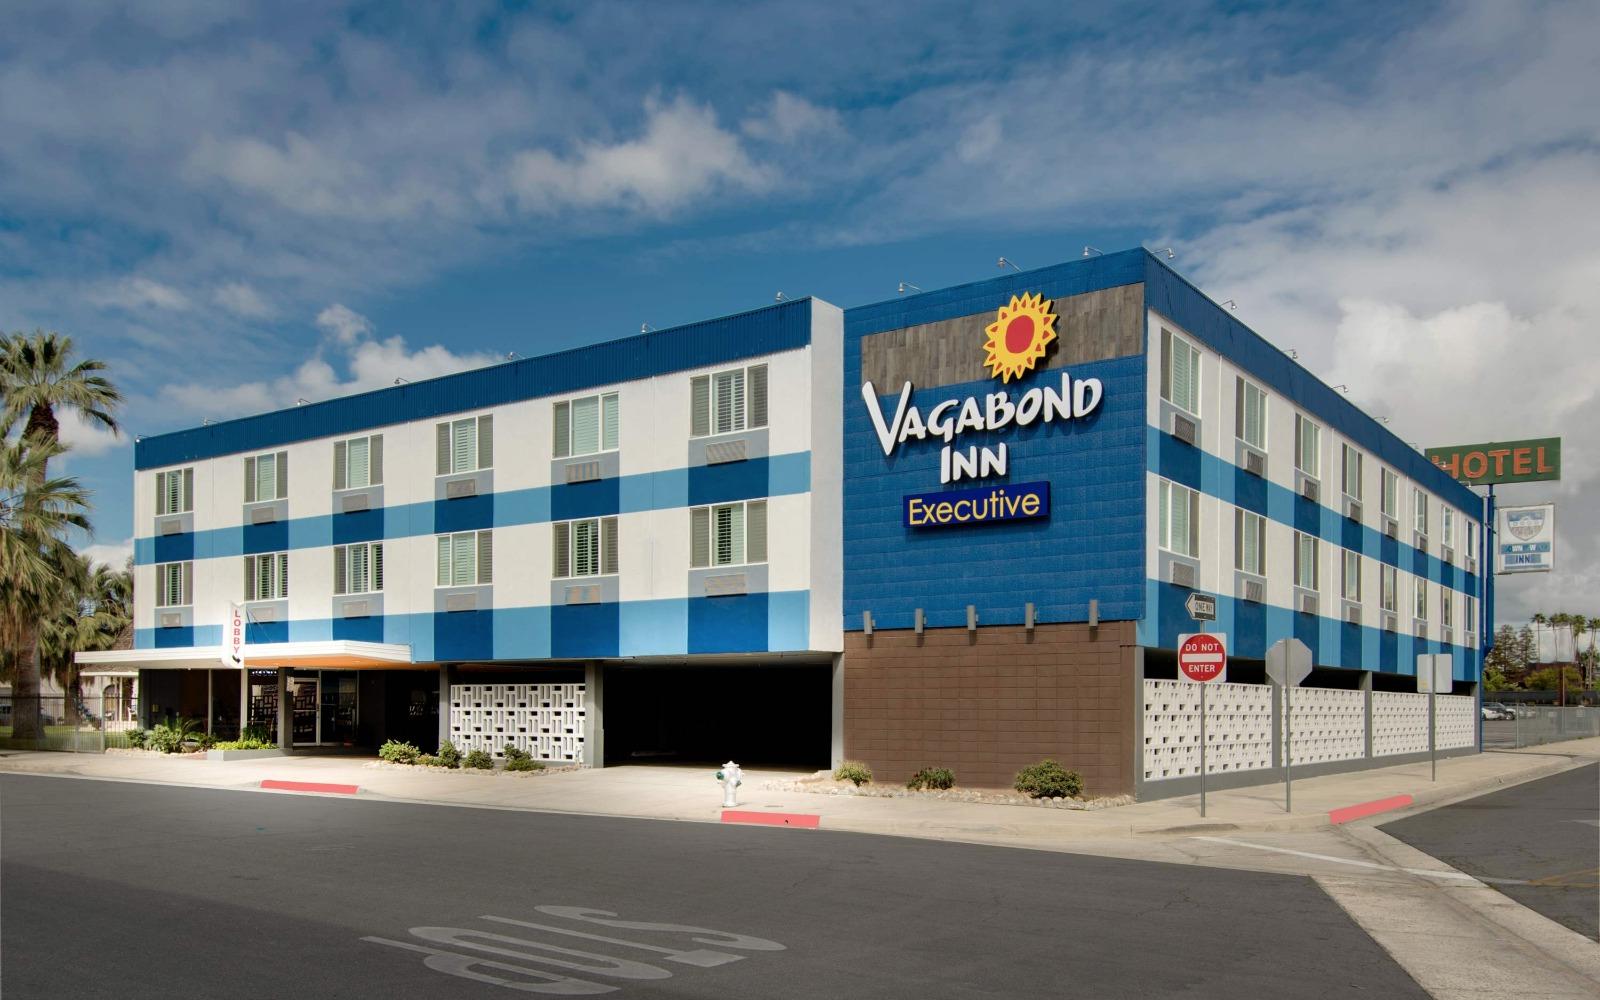 Bakersfield Downtowner Ca Hotel Vagabond Inn Bakersfield